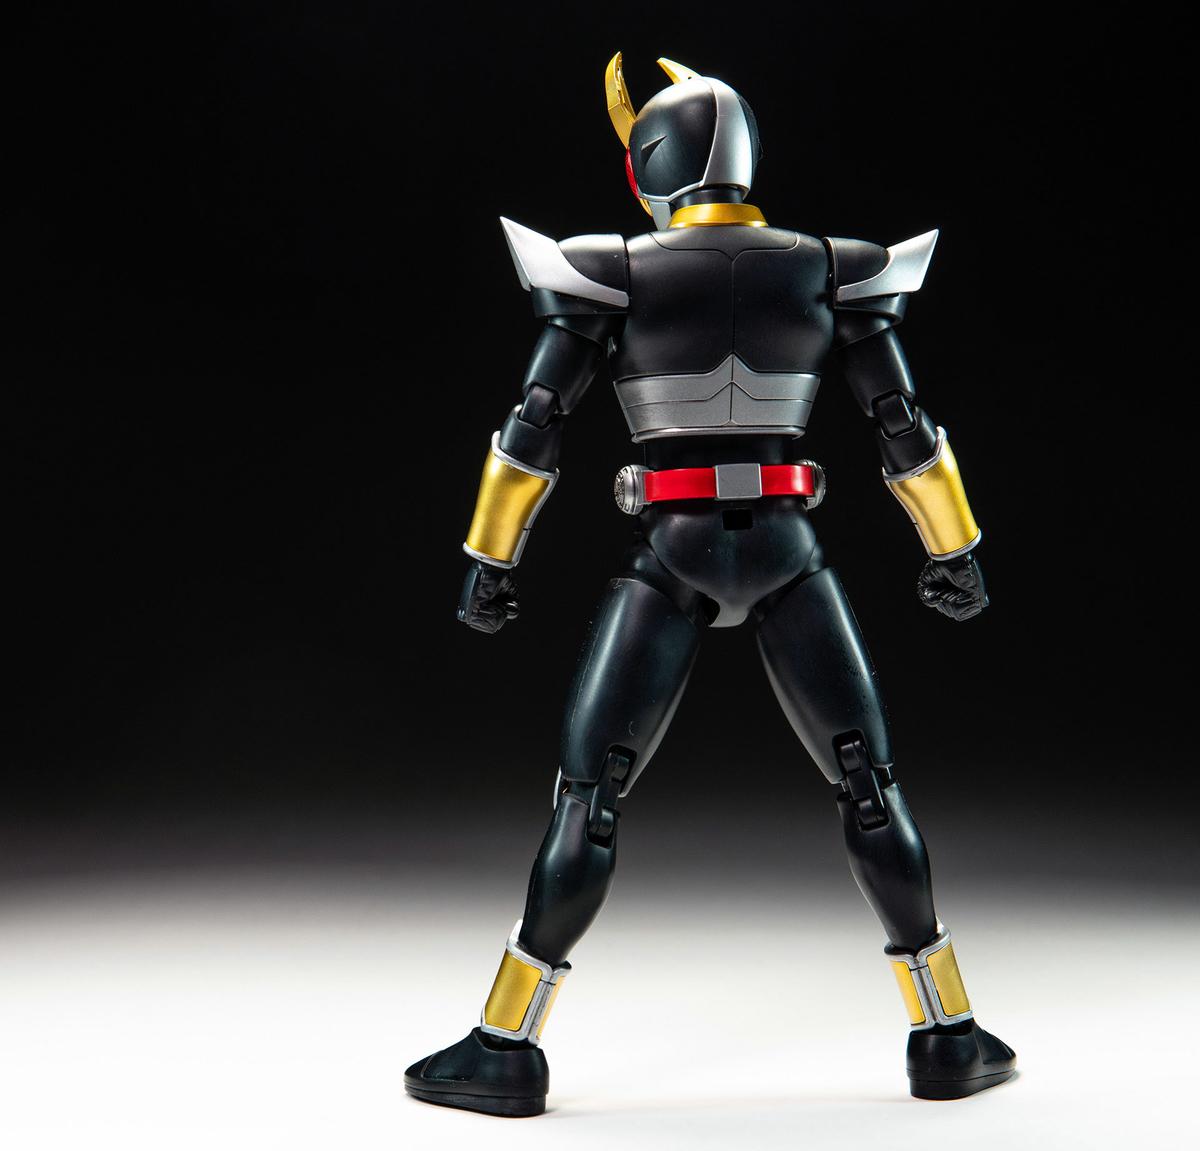 f:id:hiroban-ch:20210726005407j:plain